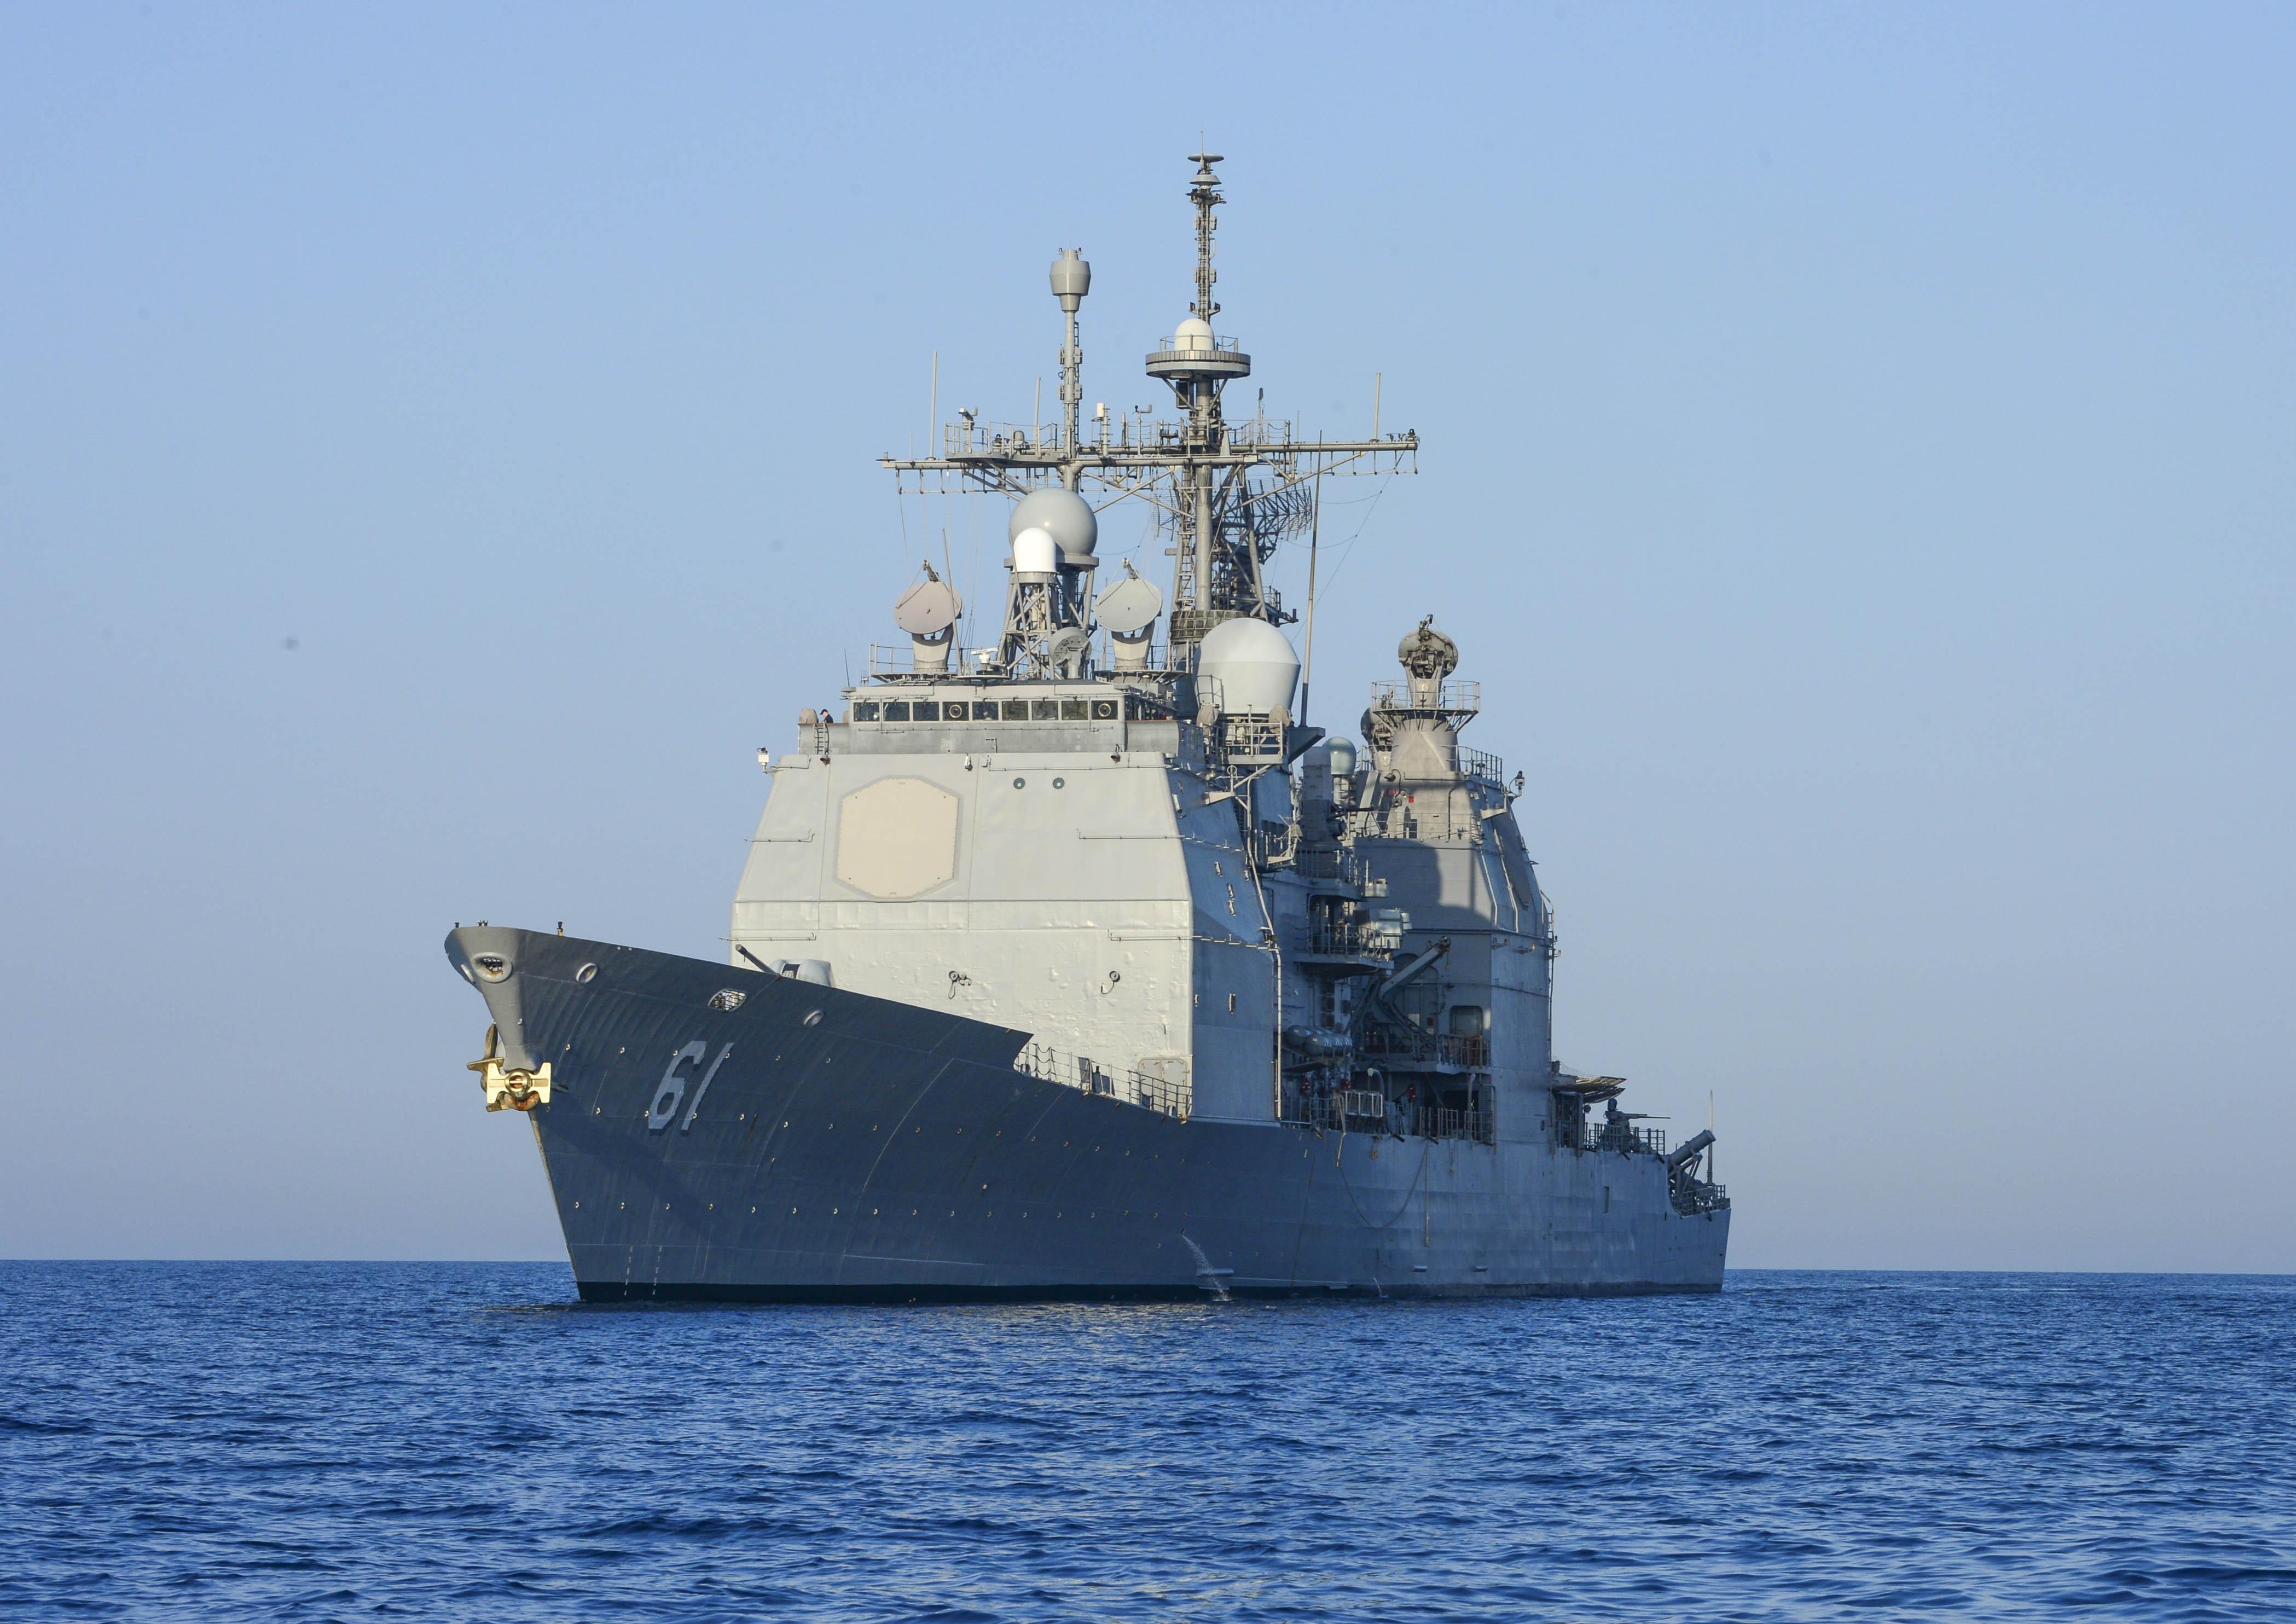 USS MONTEREY CG-61 Porto Palerma, Albanien 28.04.2013Bild: U.S. Navy